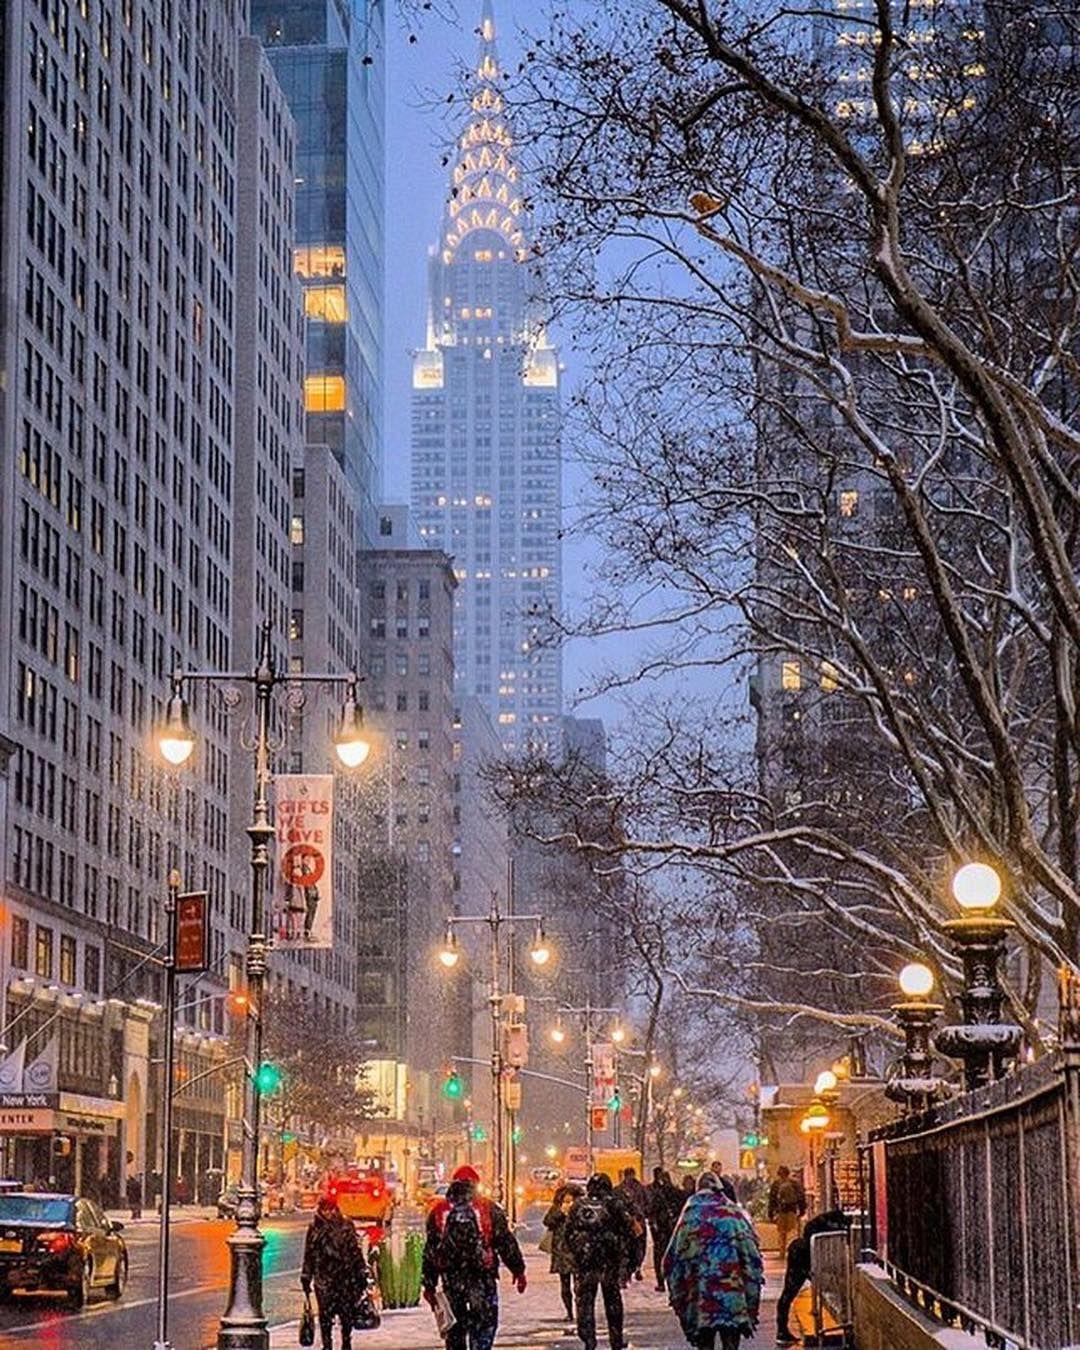 New York City On Instagram Beautiful Shot By Matthewchimeraphotography 18thregionphotography Ny Chrysler Building New York City New York Travel